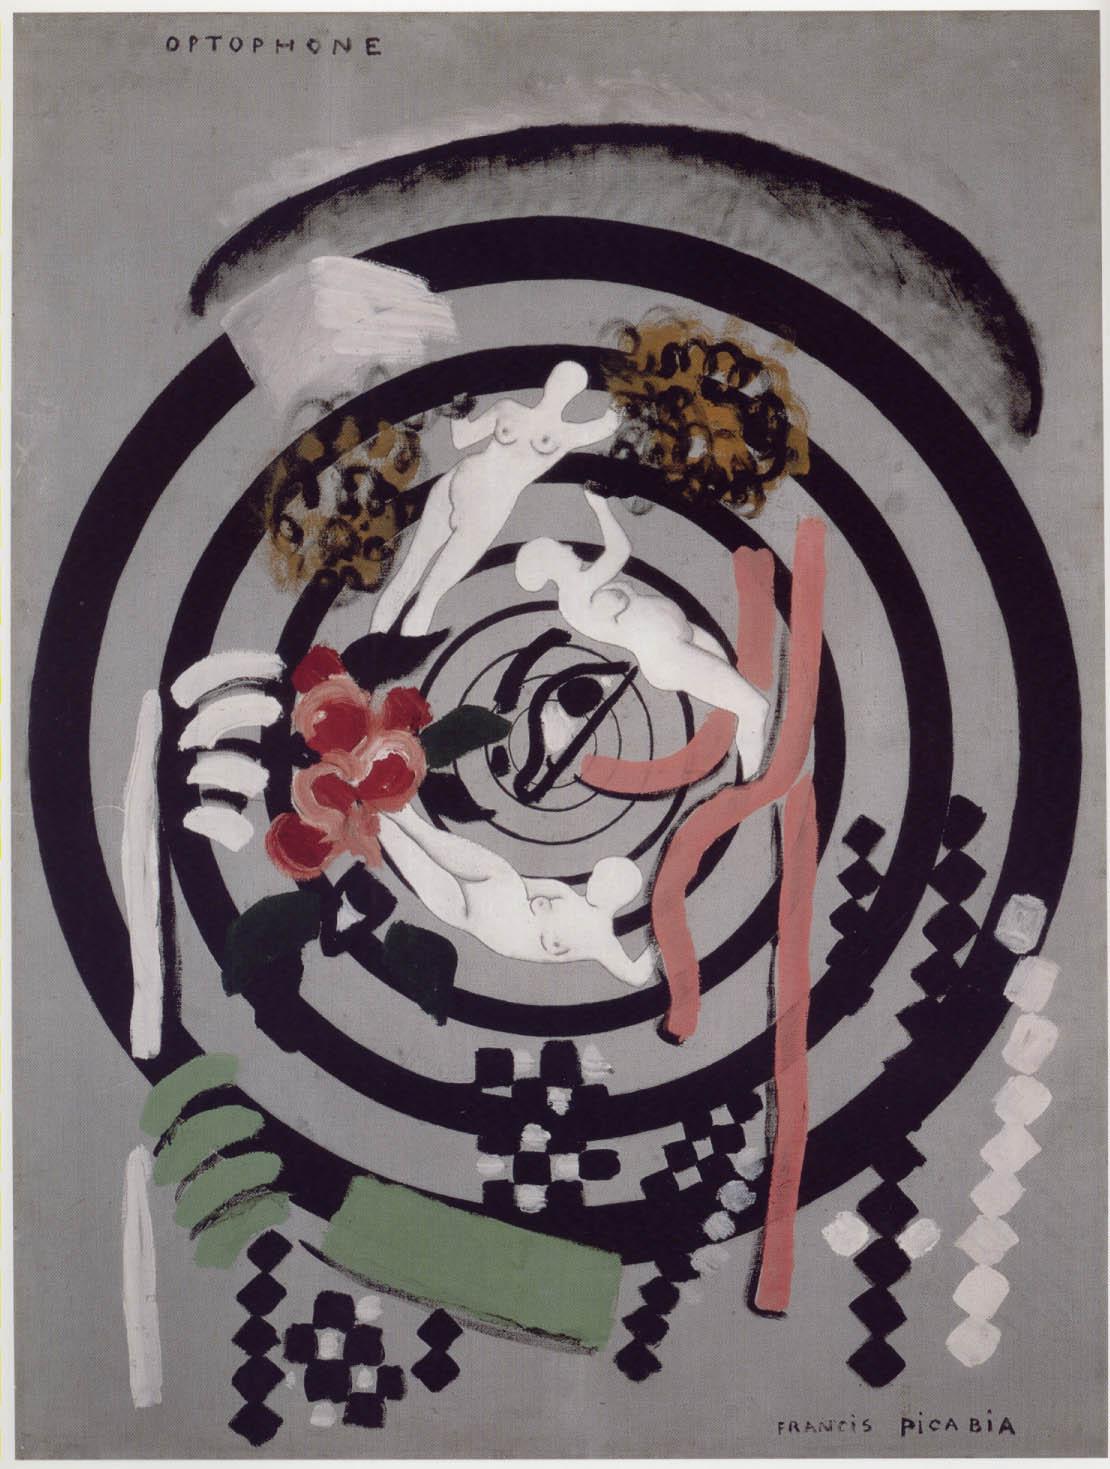 Henri Langlois, passeur d'artistes